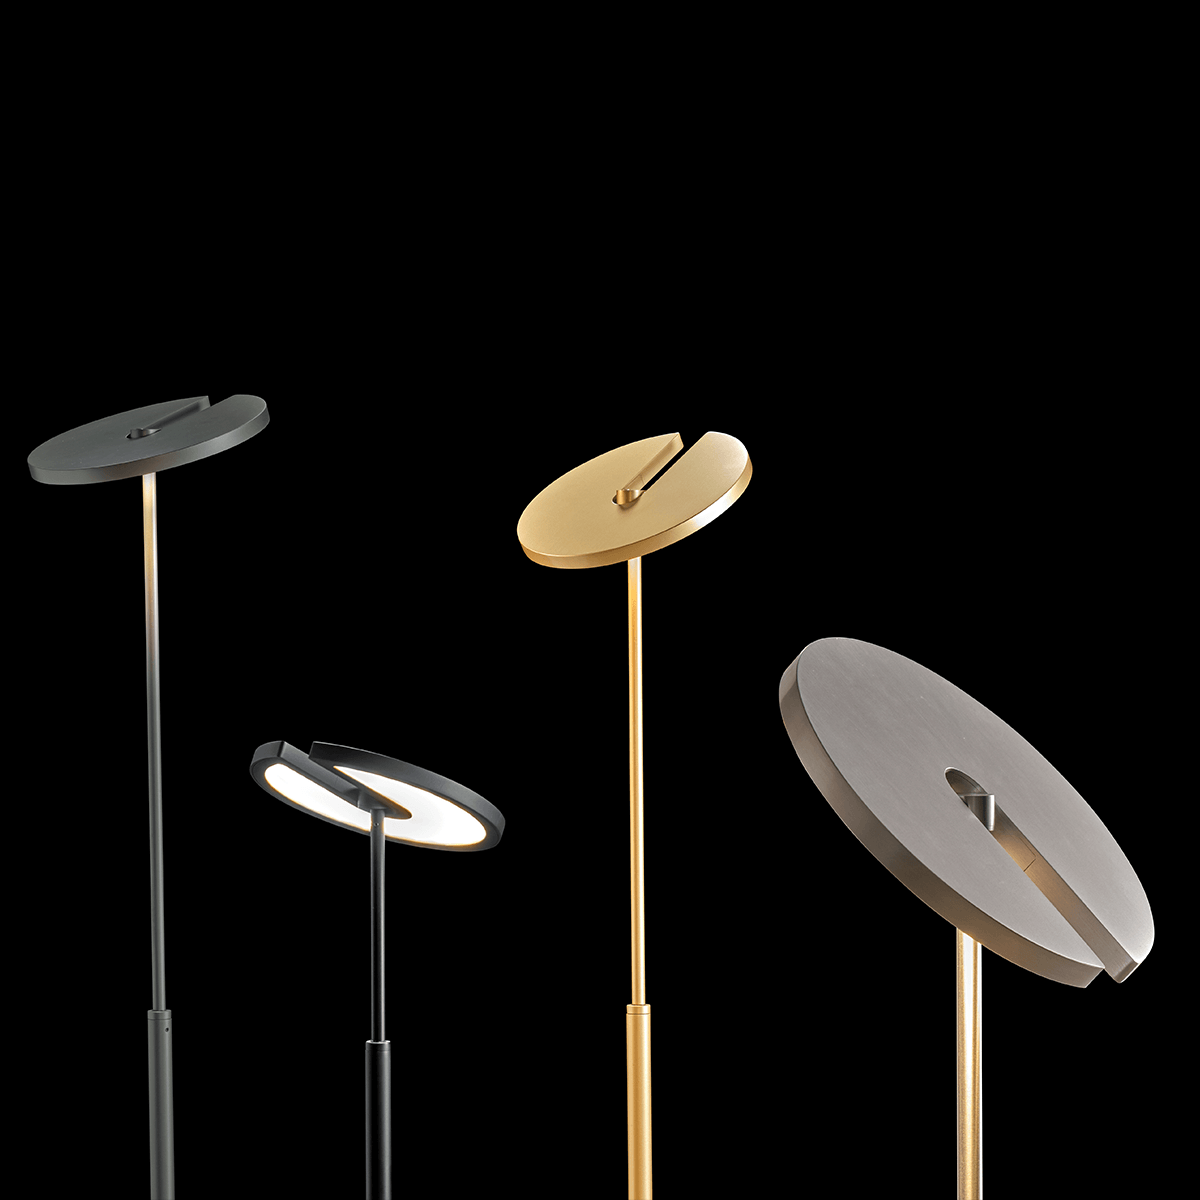 Vloerlamp Holtkotter SuperNova Hoogteverstelbaar In 4 Kleuren